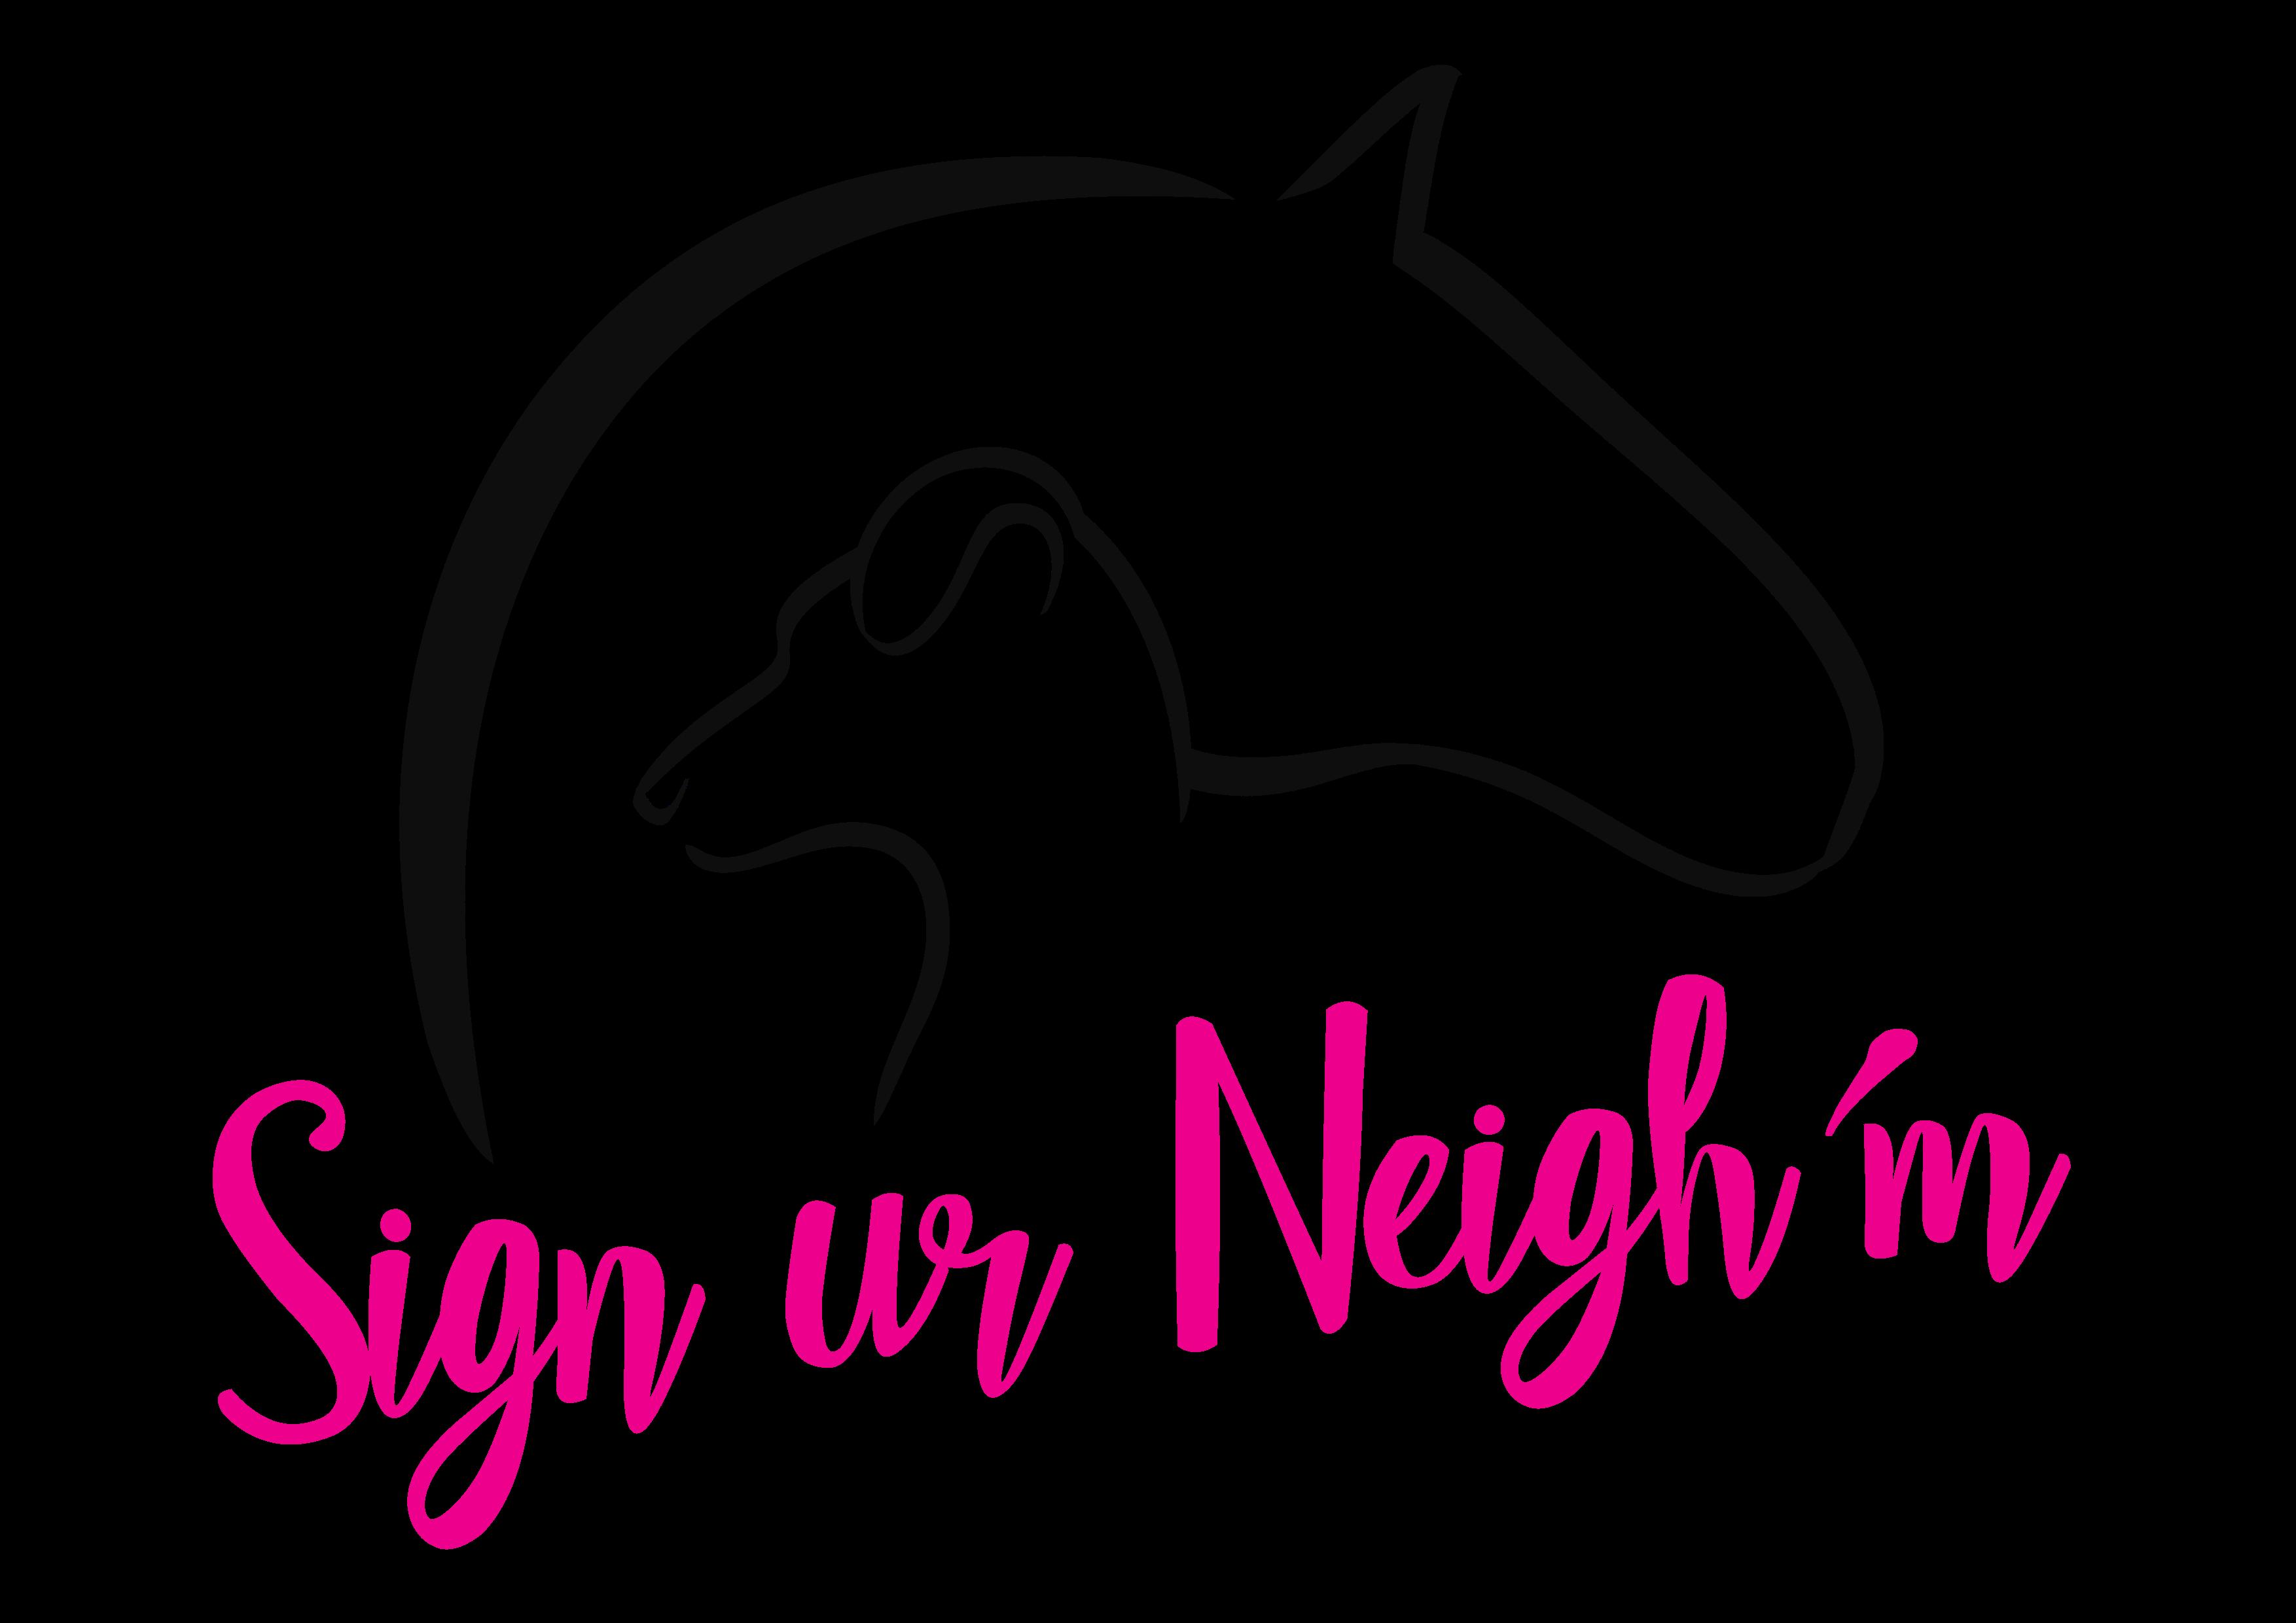 Sign ur Neighm